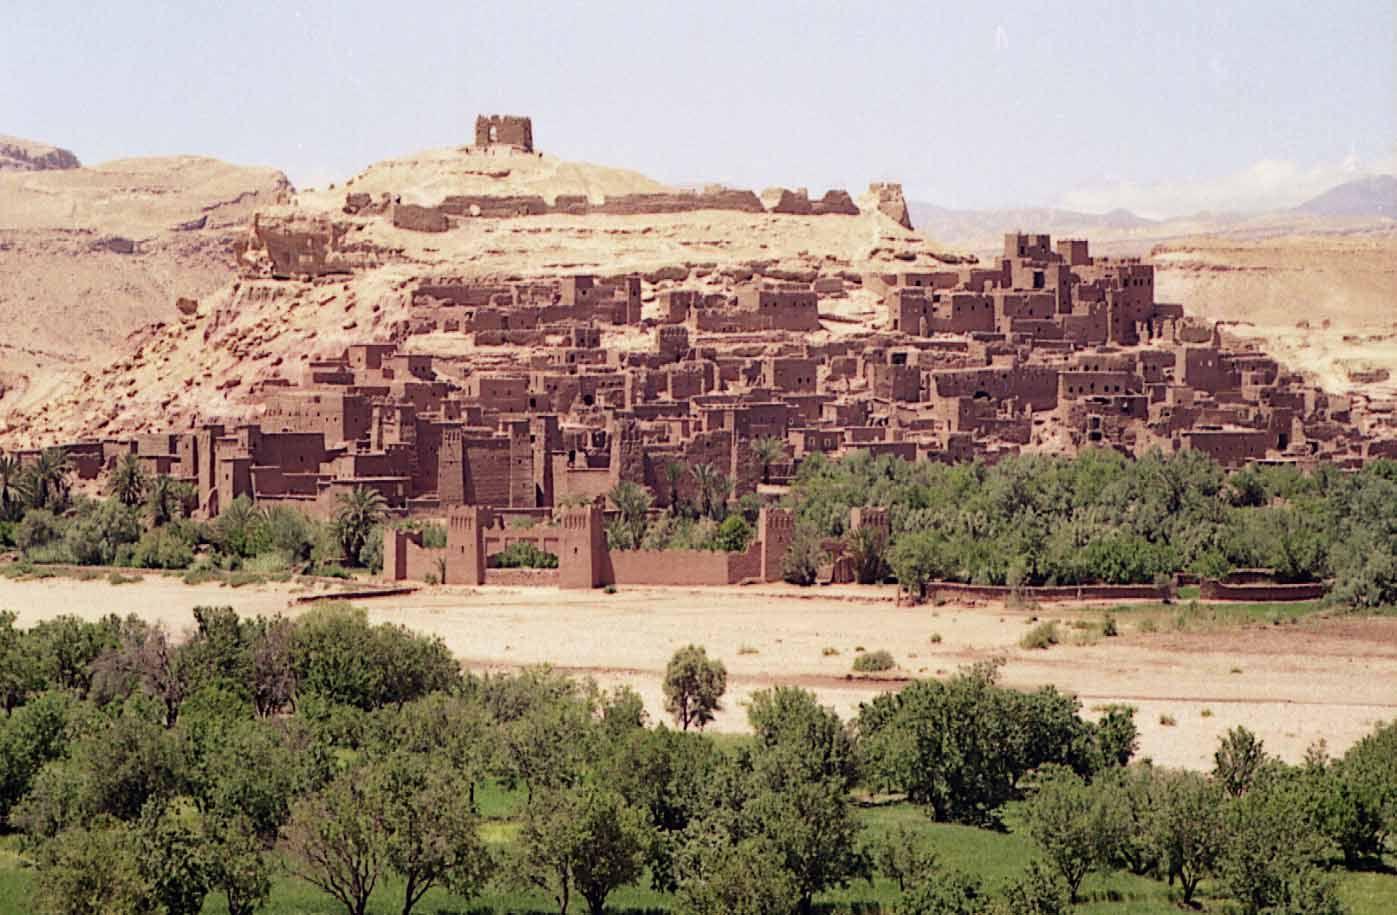 Ait Ben Haddou Day Trip - Best Morocco Desert Tours